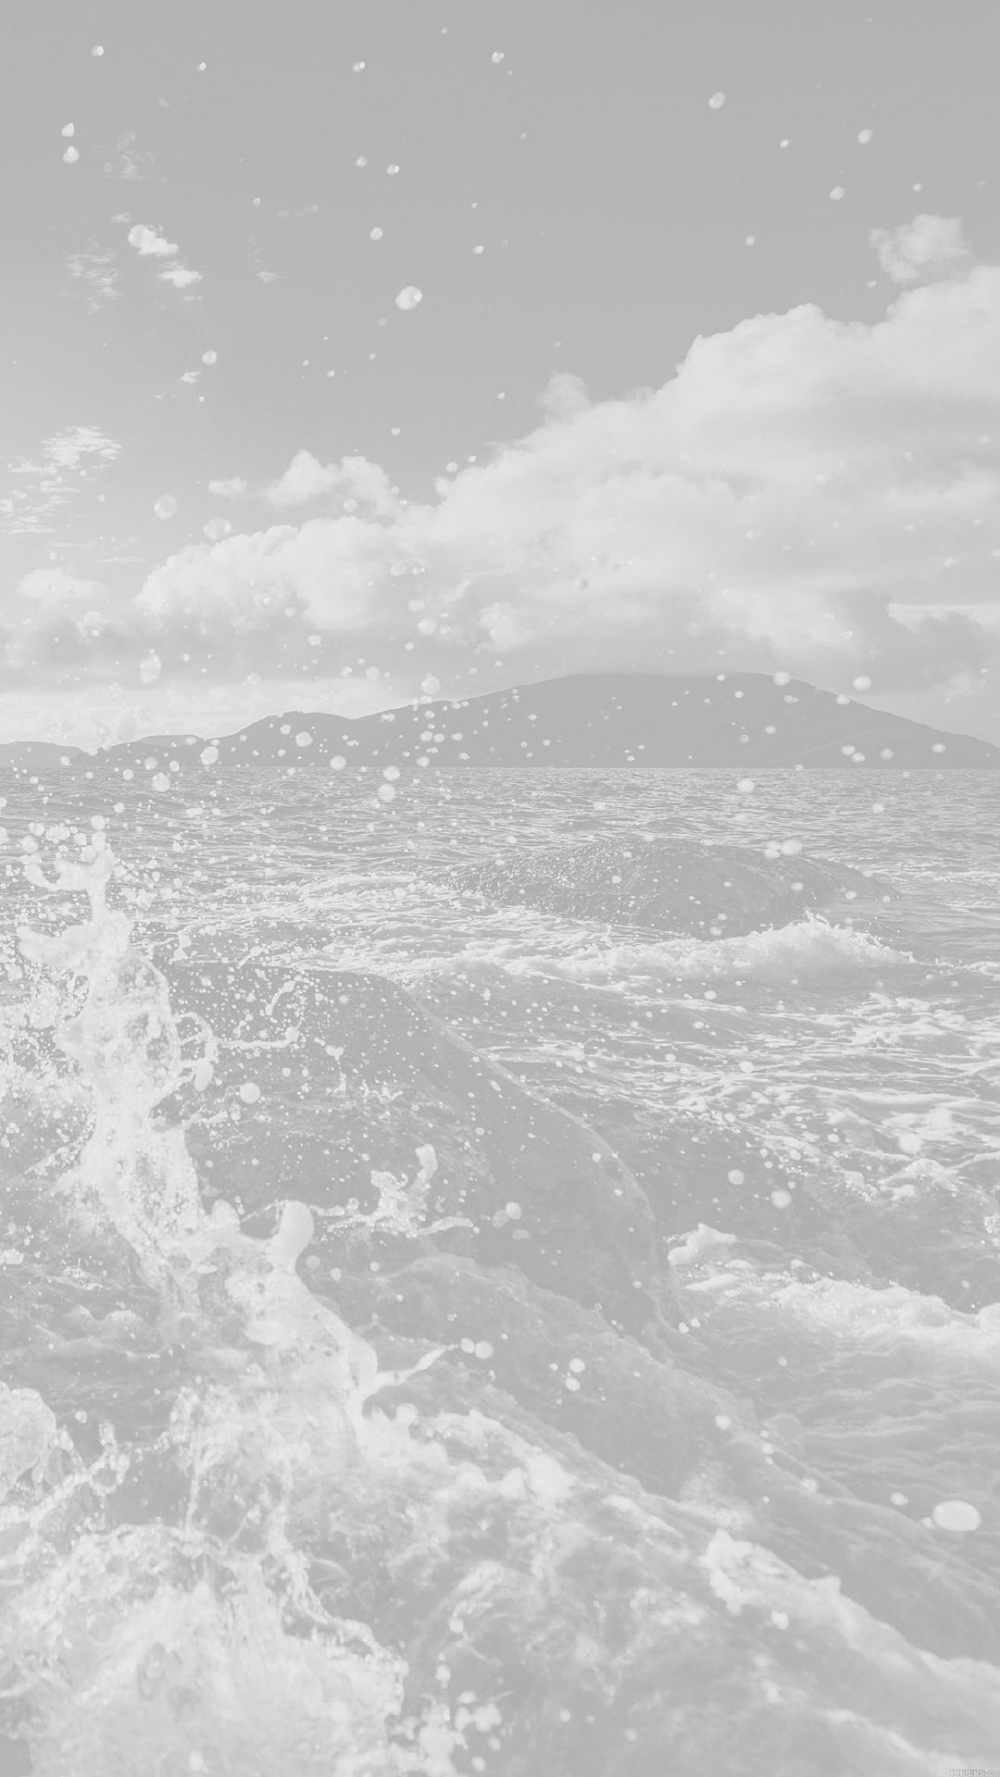 Phone Wallpaper Landscape Ocean Sea Sea 6wallpaper Wallpaprs Background Iphone Iphone11 Iphonewallpapers Grey Wallpaper Iphone Wallpaper Phone Wallpaper